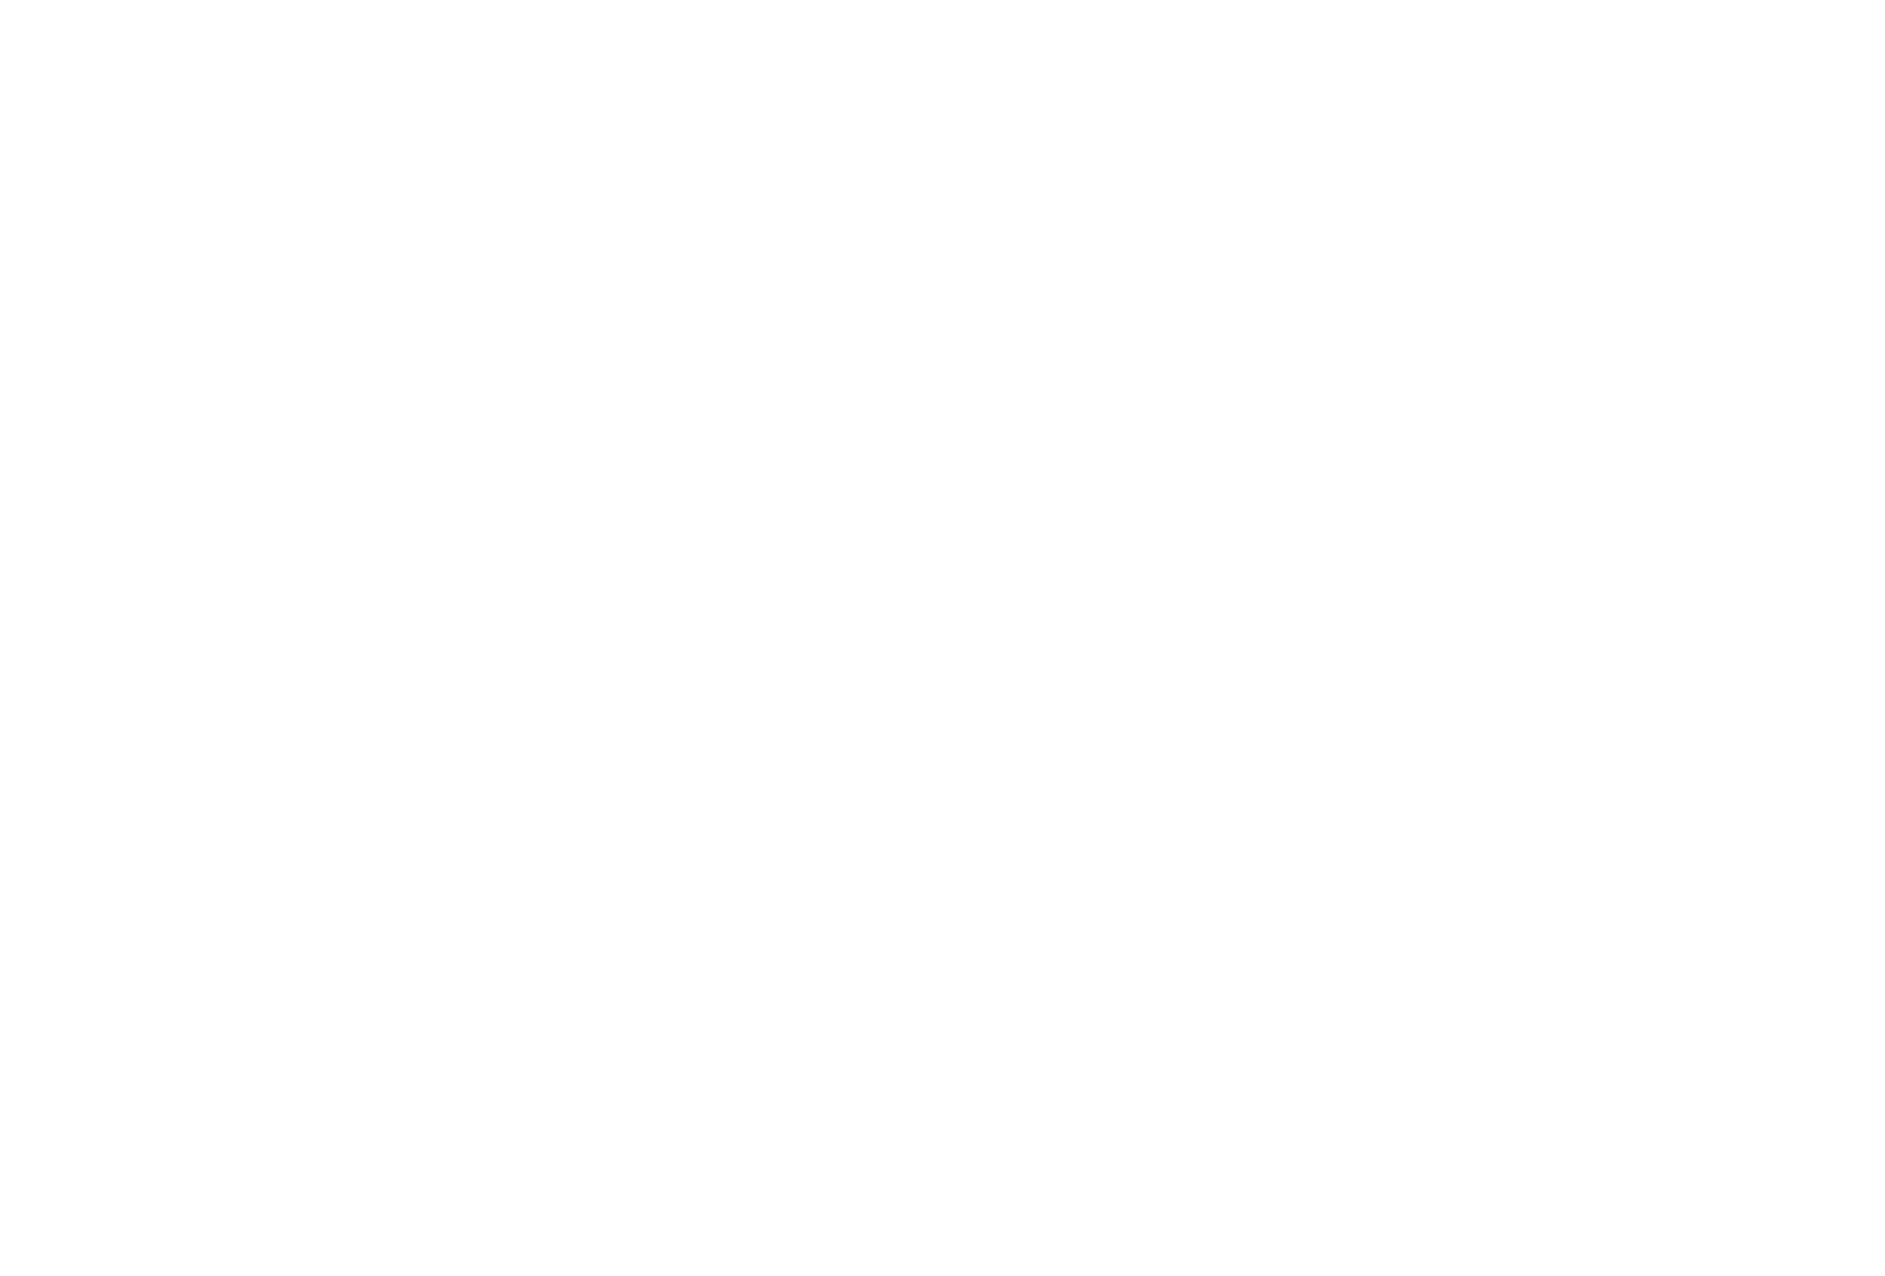 Spitexana Webseite Redesign & SEO